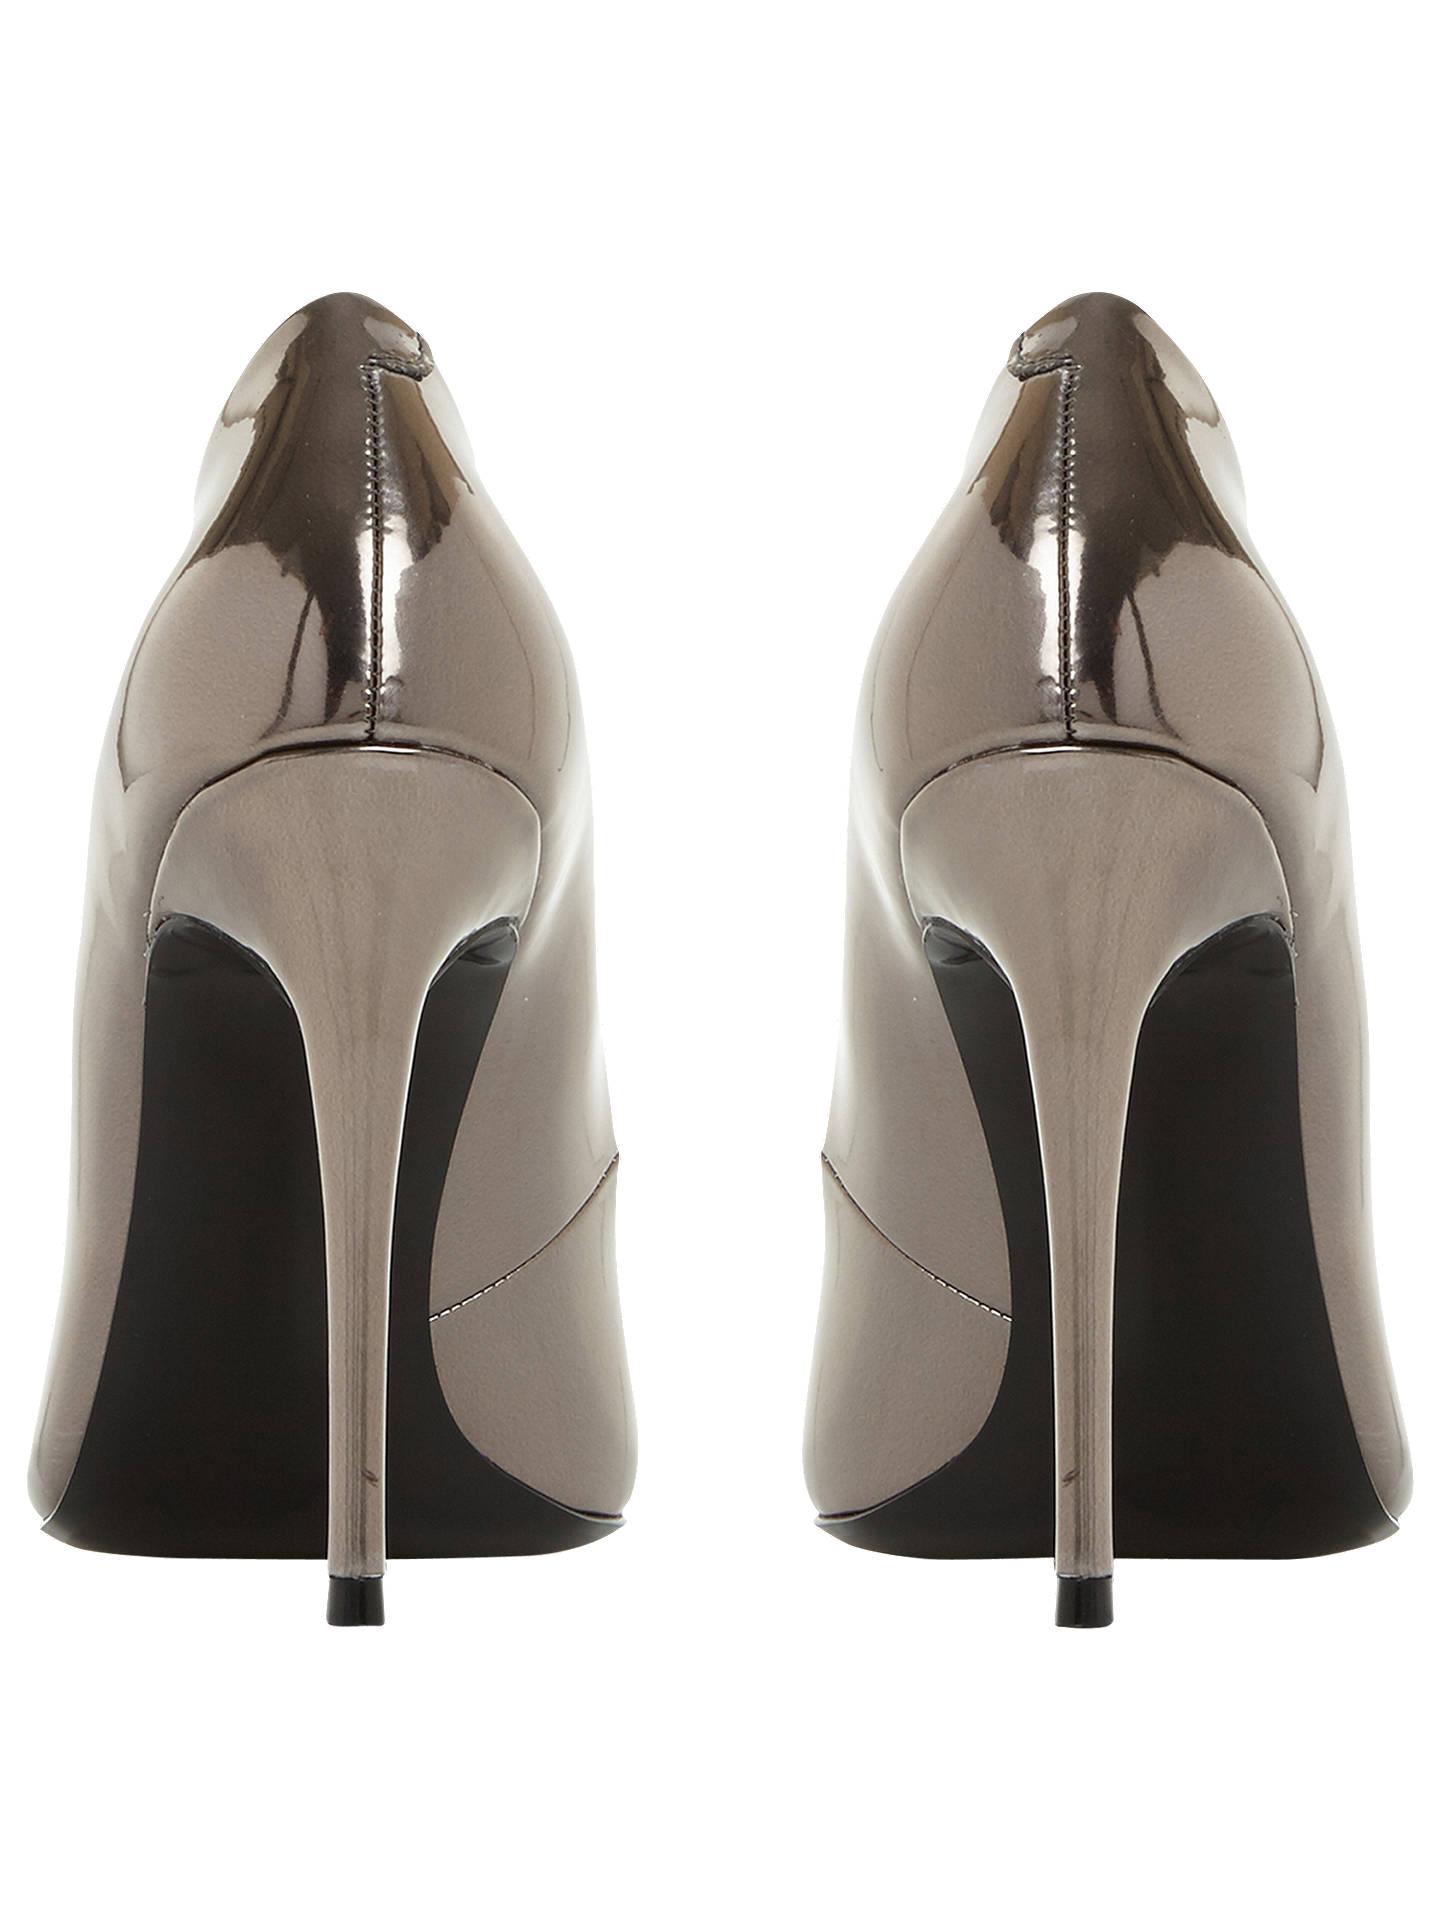 6cceece28fc Buy Steve Madden Daisie Stiletto Heeled Court Shoes